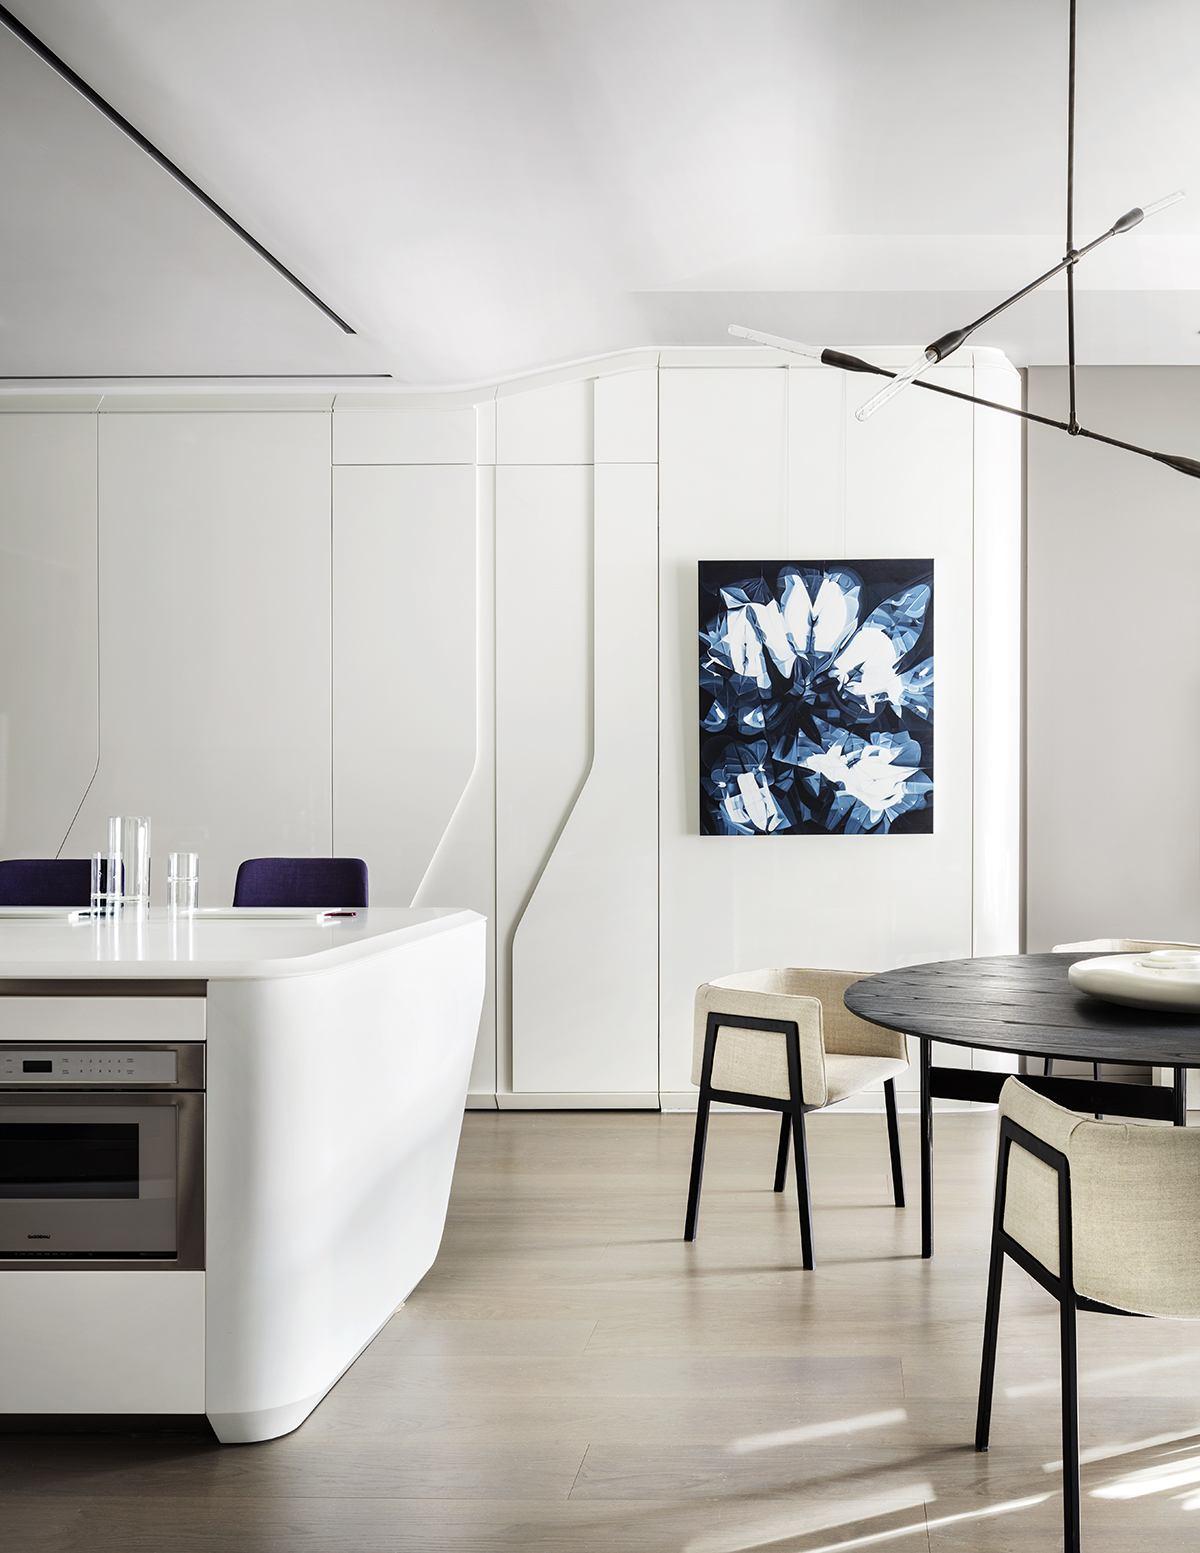 Interior design companies new york - Interiors Architecture New Developments Celebrities Trends History My